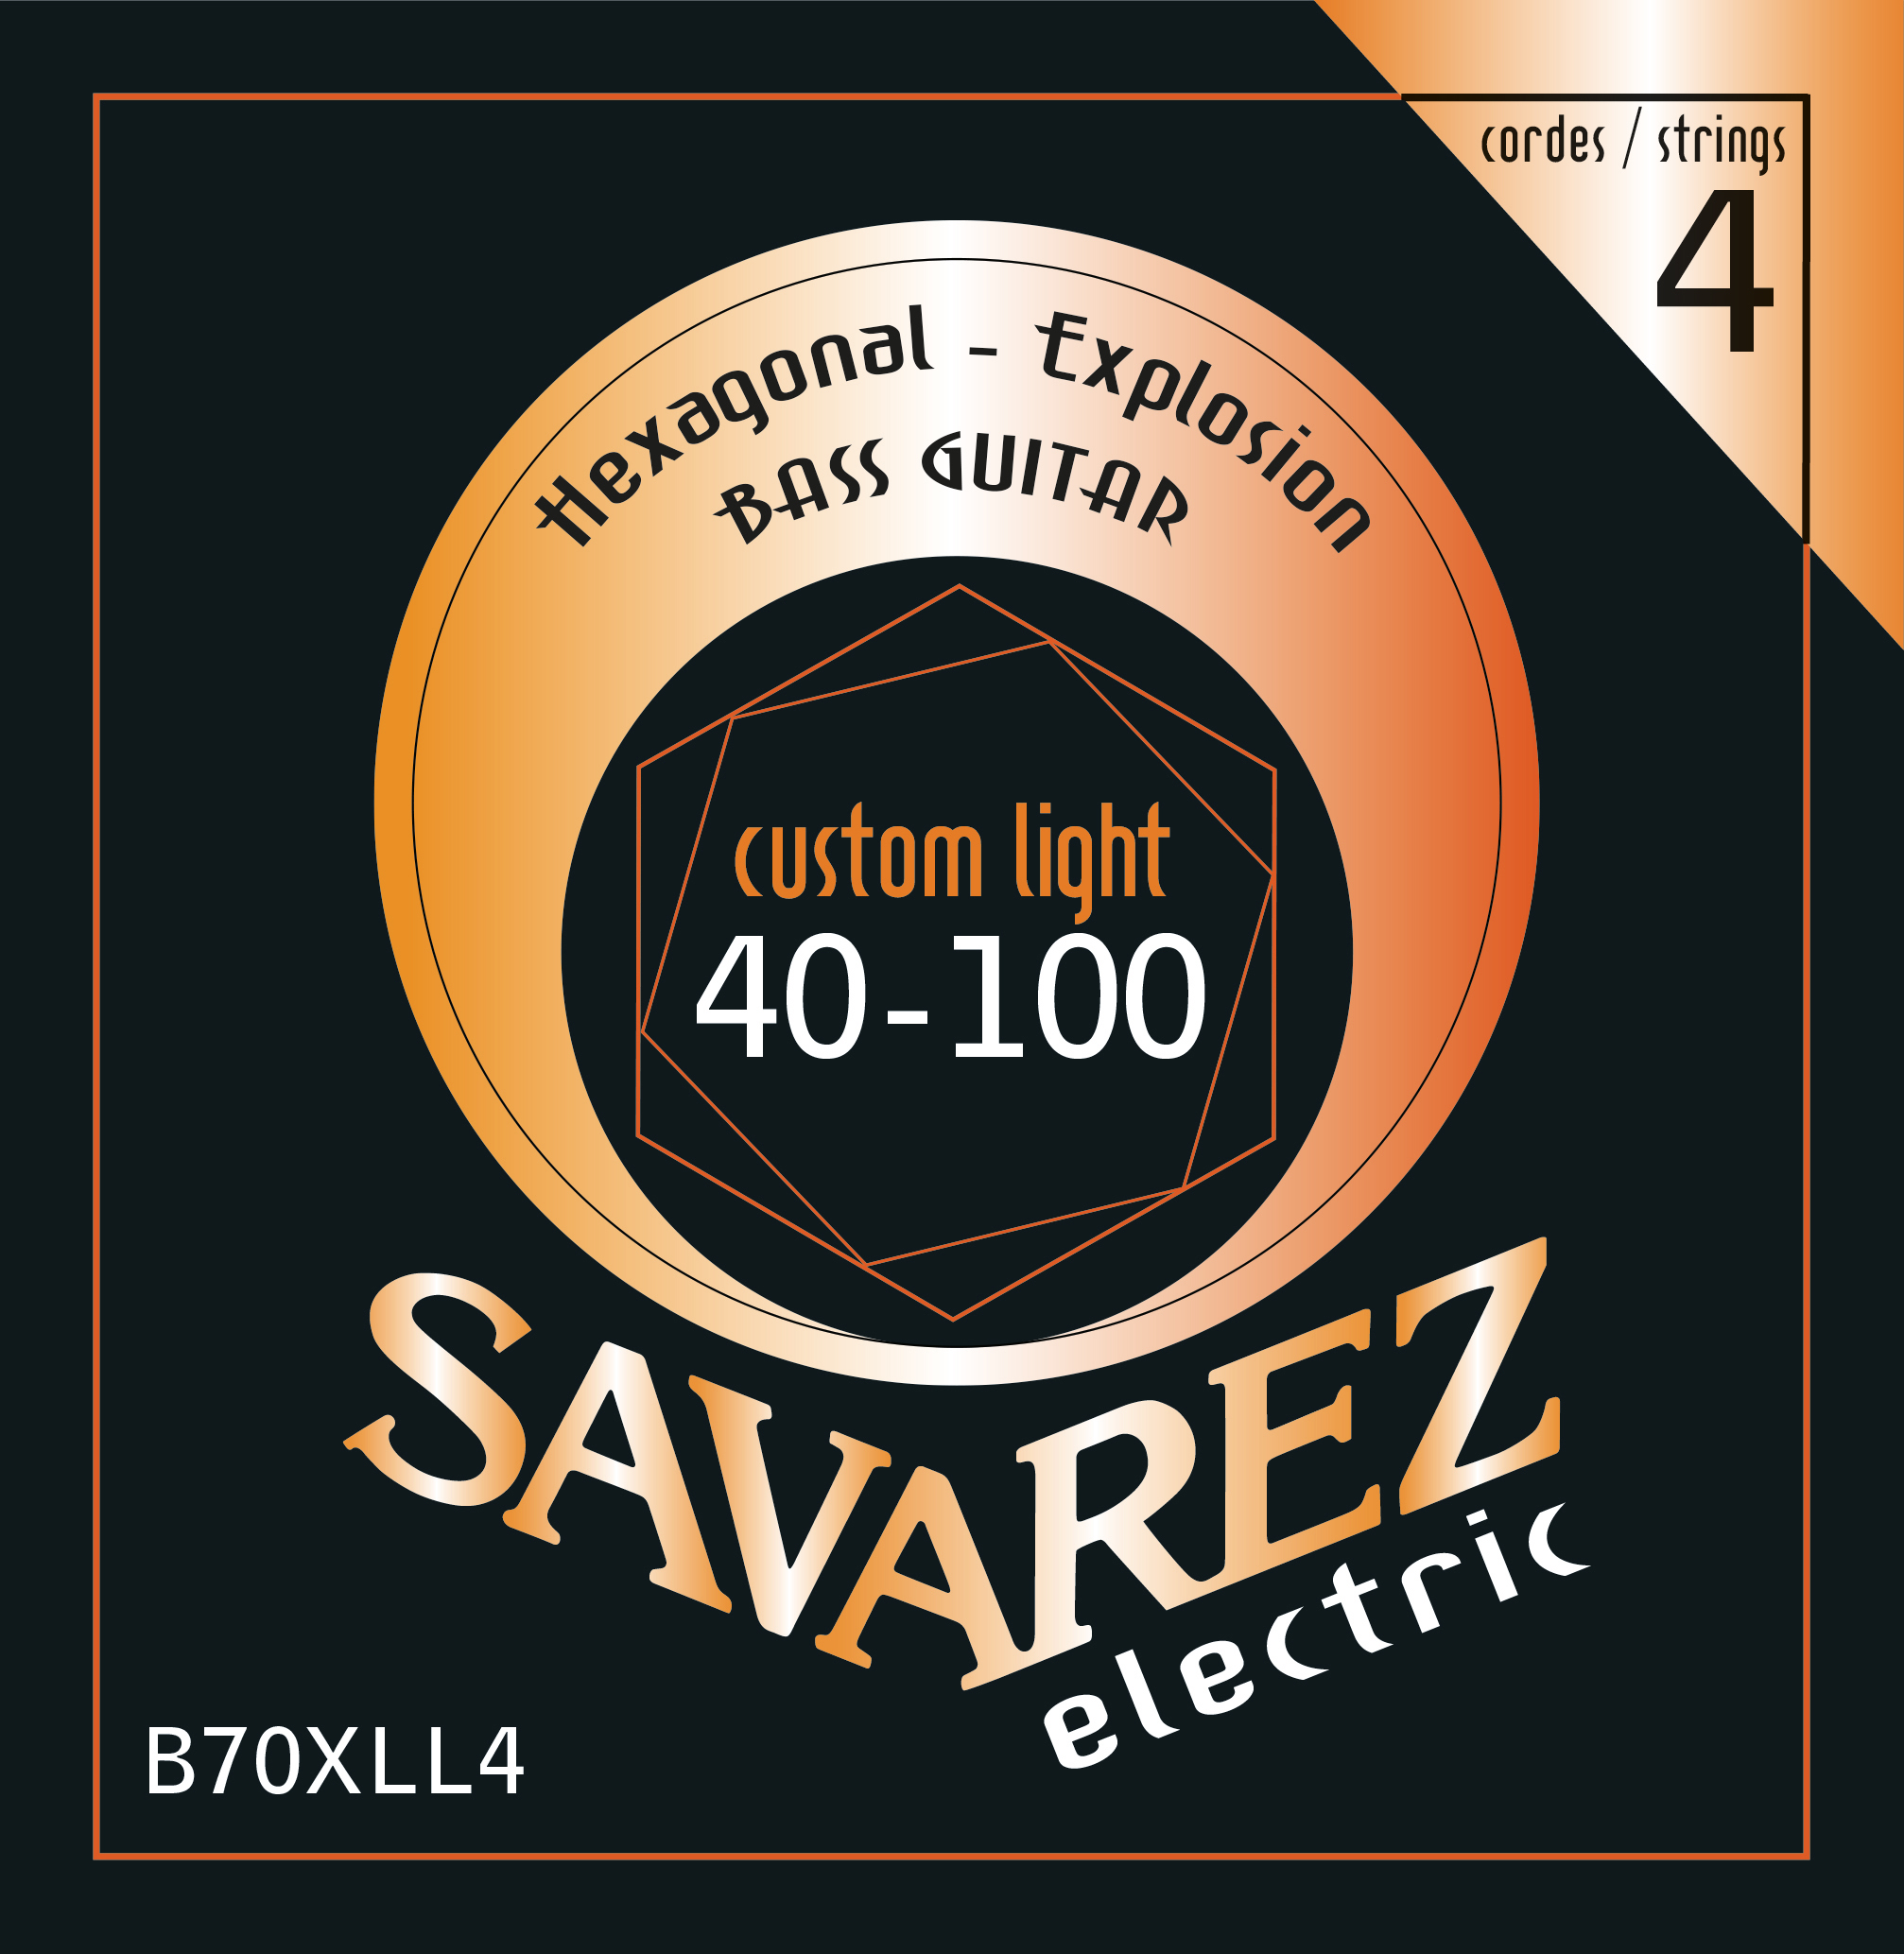 SAVAREZ ELECTRIC HEXAGONAL EXPLOSION BASSE B70XLL4